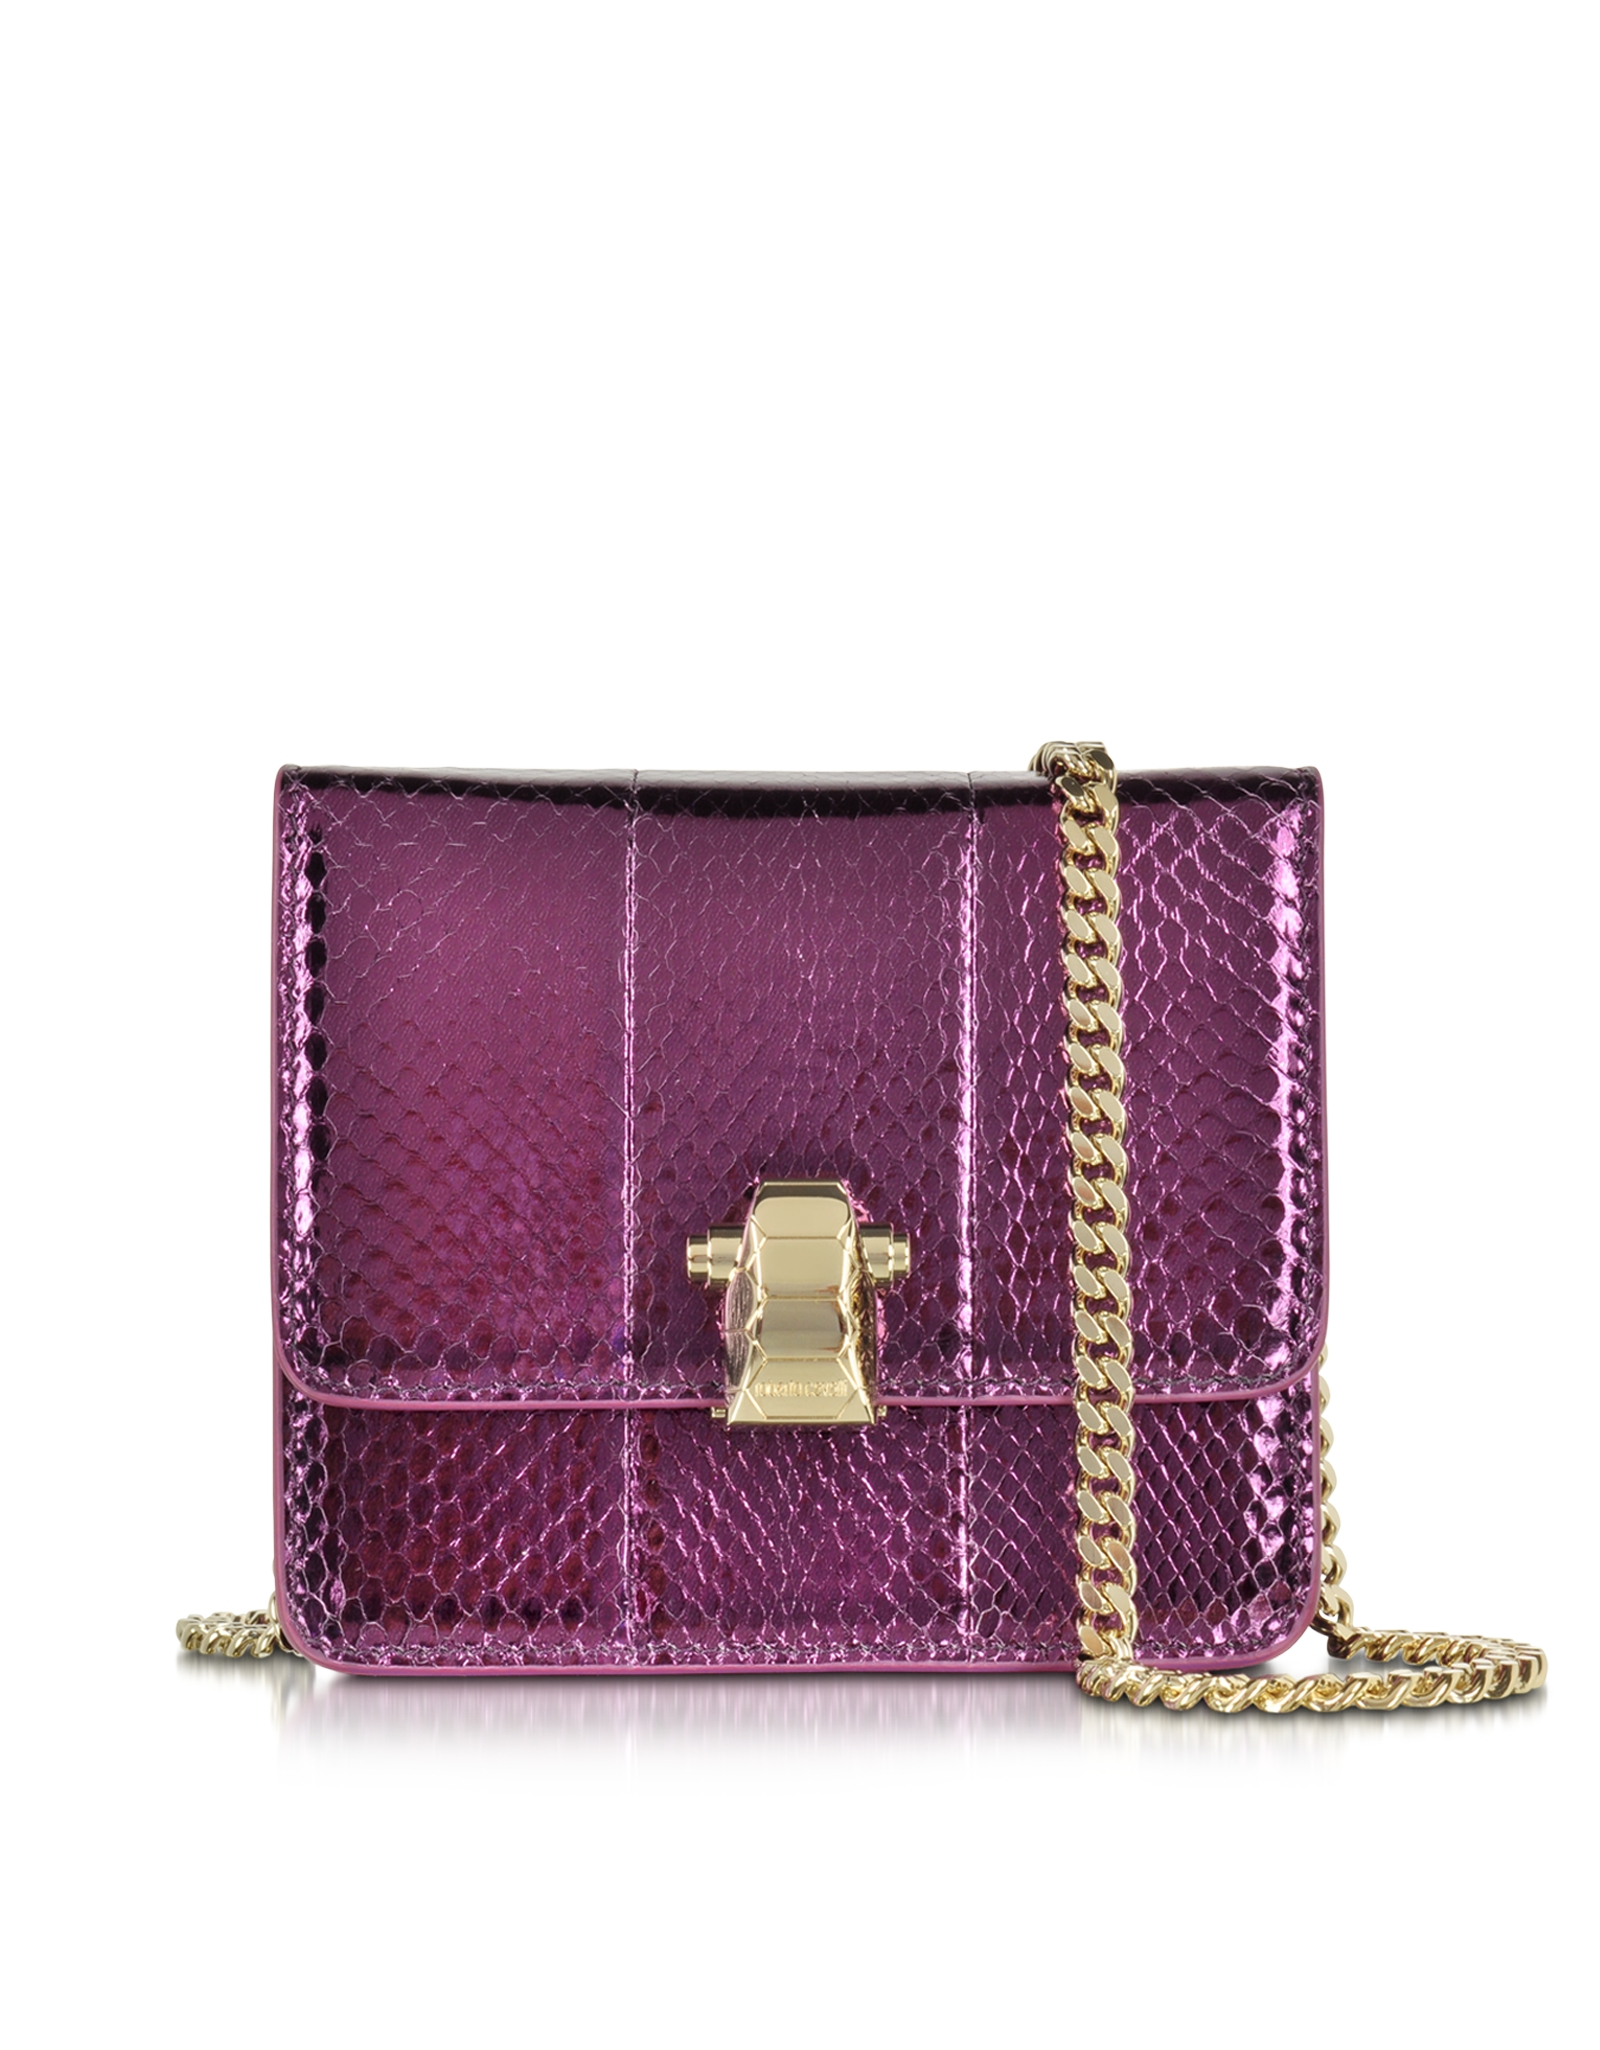 Roberto Cavalli Metallic Leather Purple Studded Flower Shoulder Bag t5MpNPiGFe